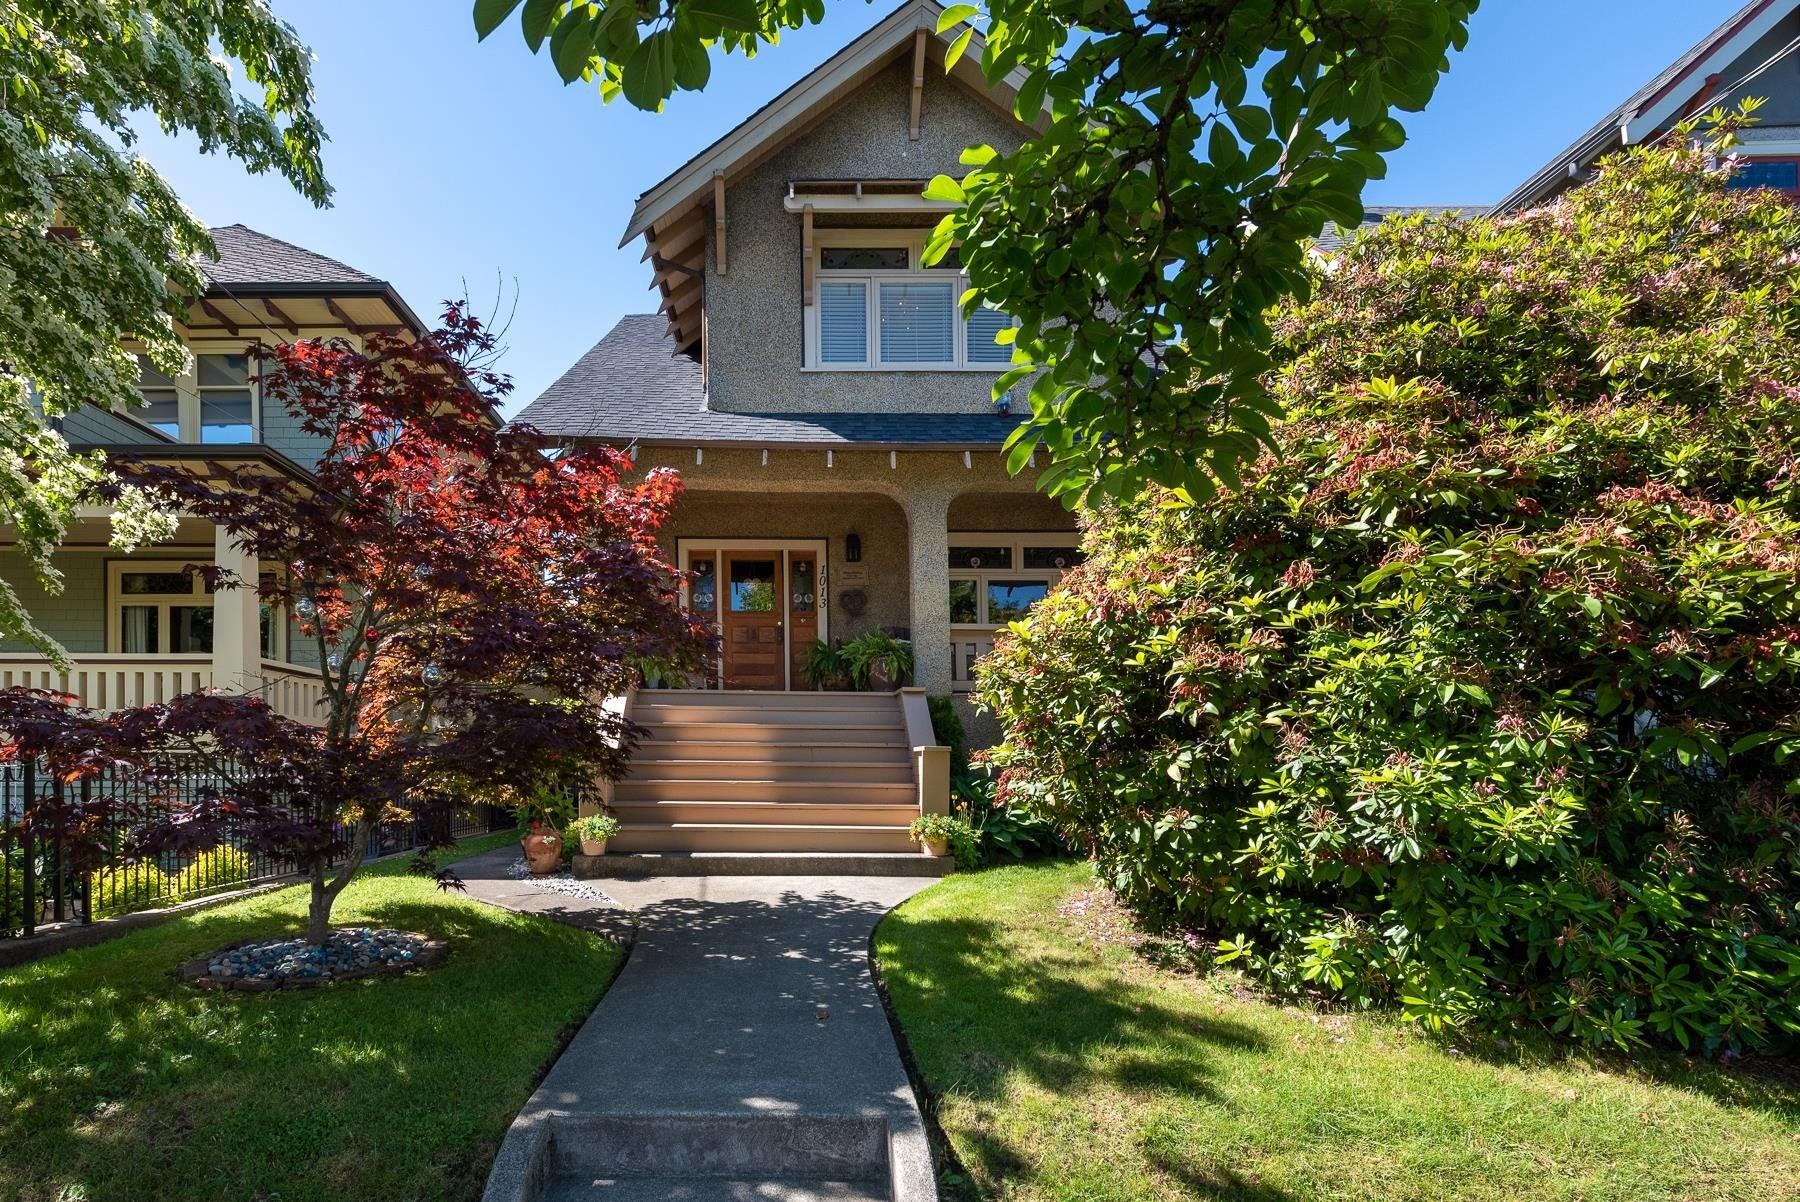 1013 HAMILTON STREET - Moody Park House/Single Family for sale, 3 Bedrooms (R2627468)